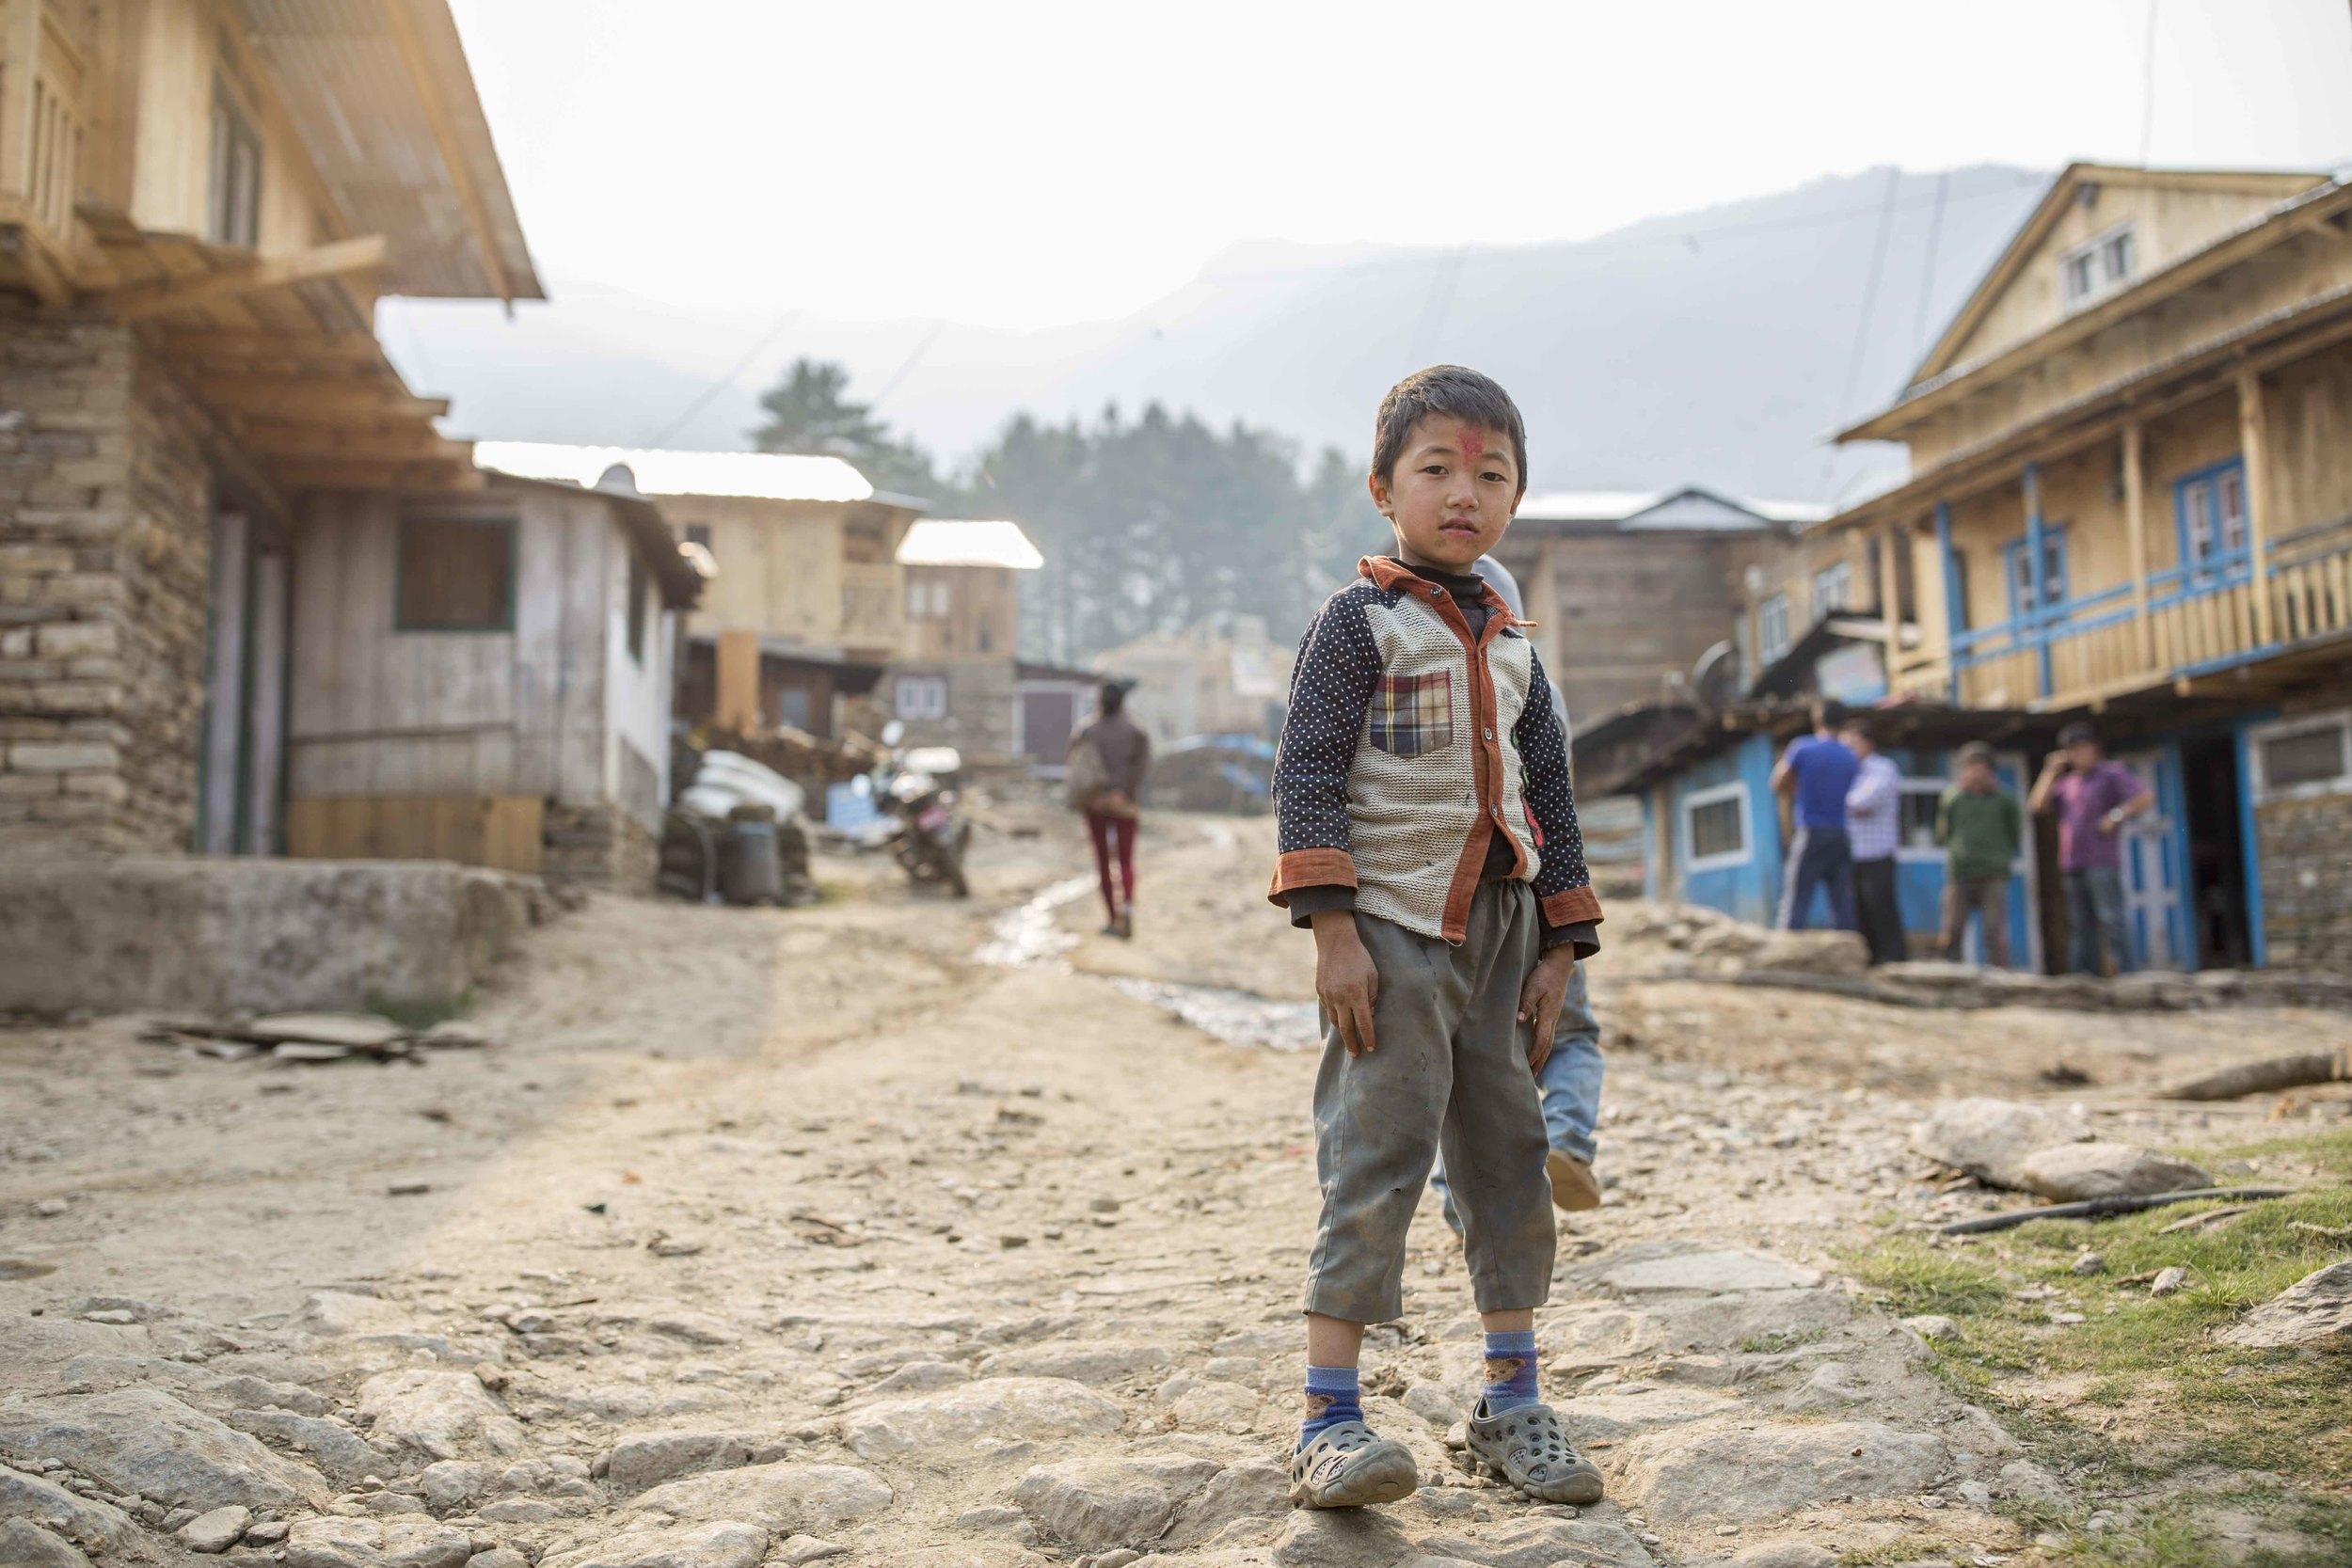 Ramechap, Nepal